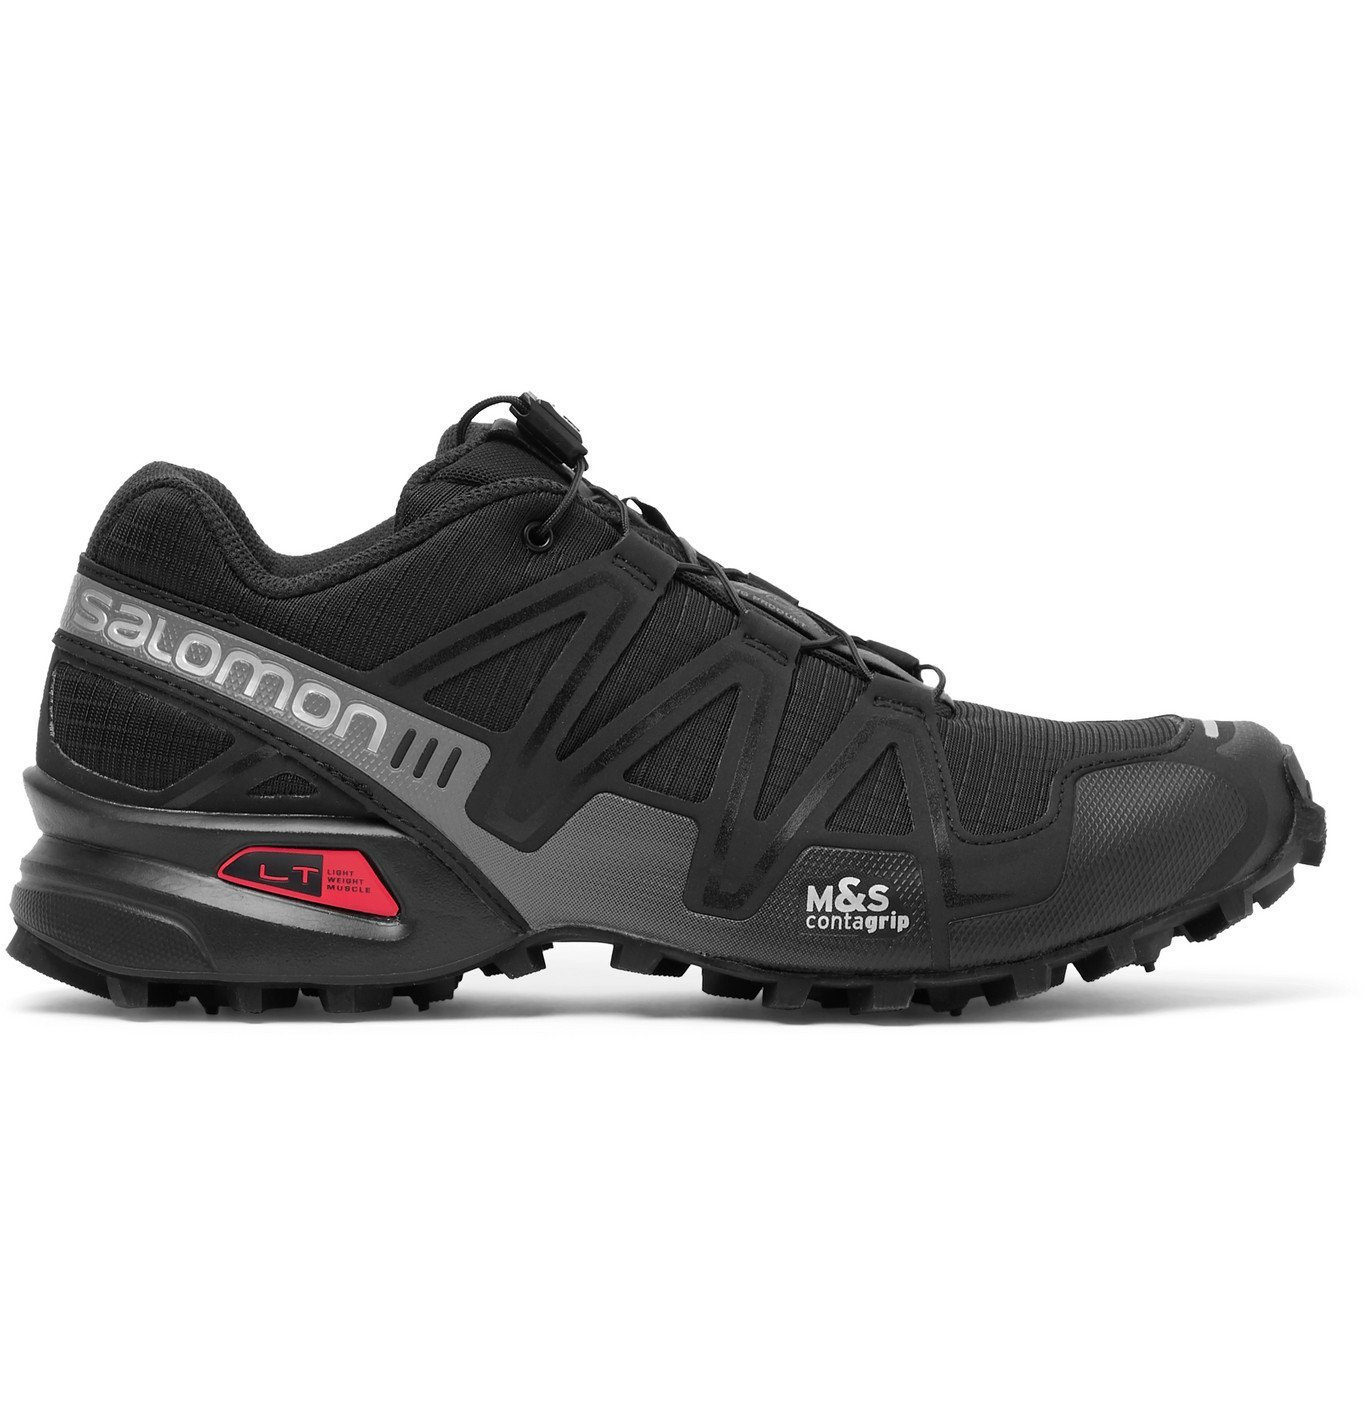 Photo: Salomon - Speedcross 3 ADV Ripstop, Mesh and Rubber Running Sneakers - Black